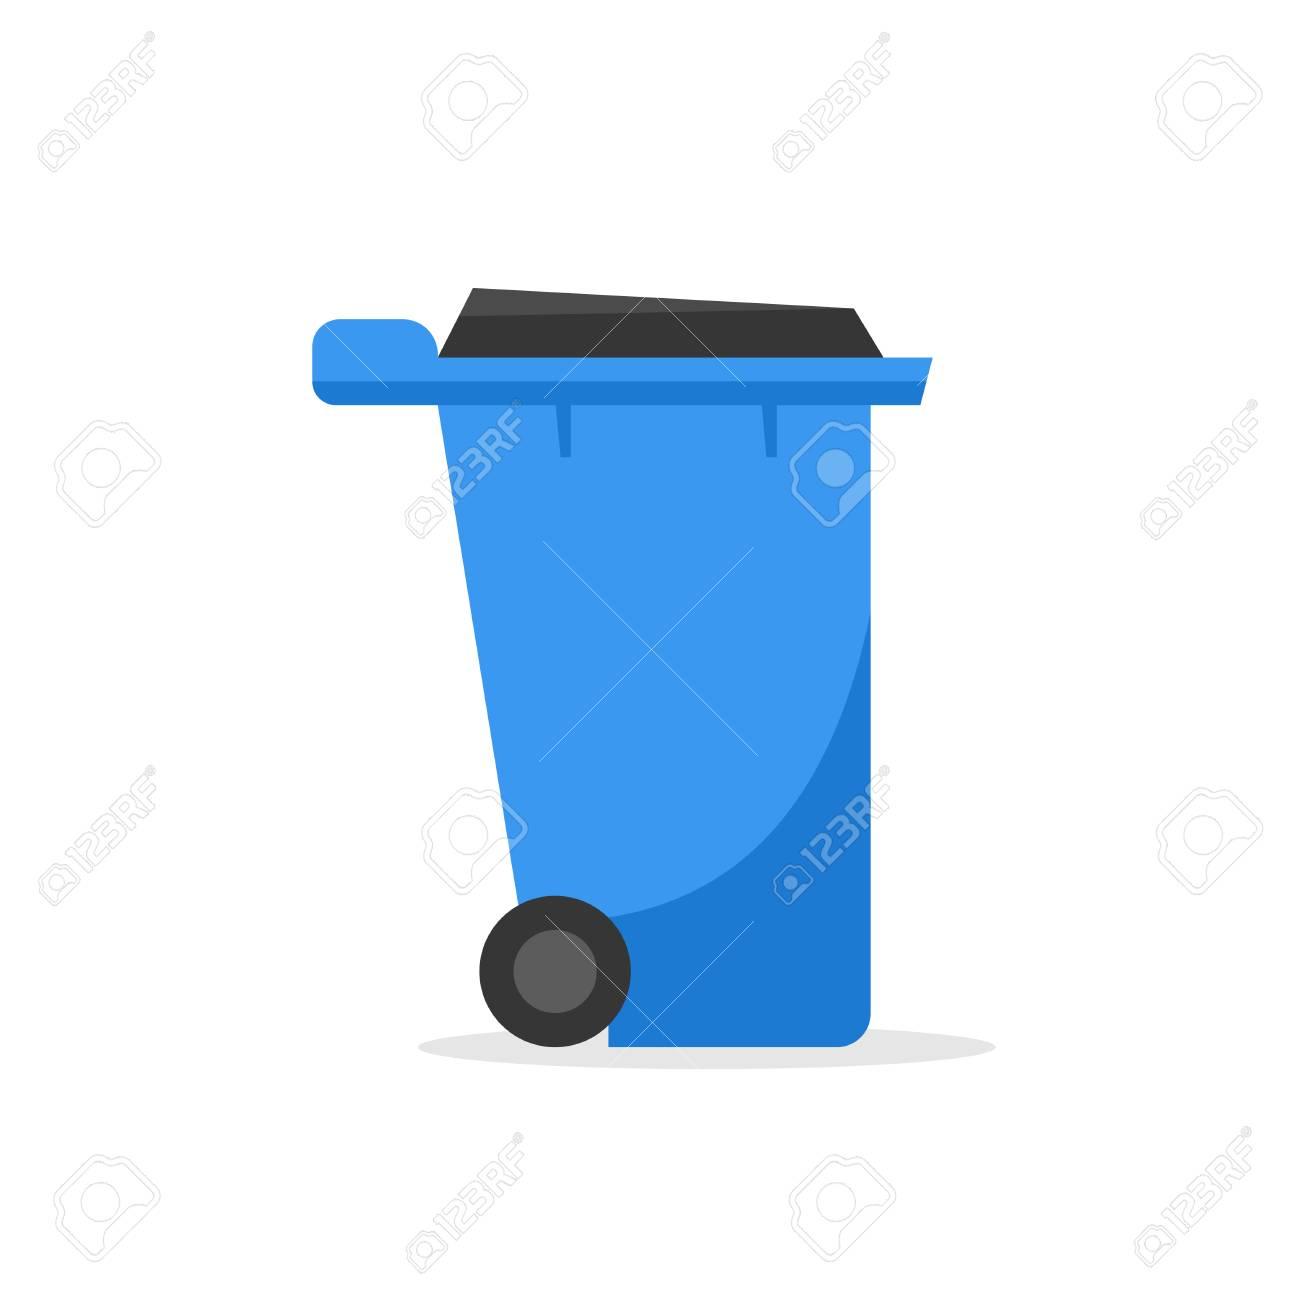 Plastic wheelie refuse waste bin isolated on a white background - 104890268